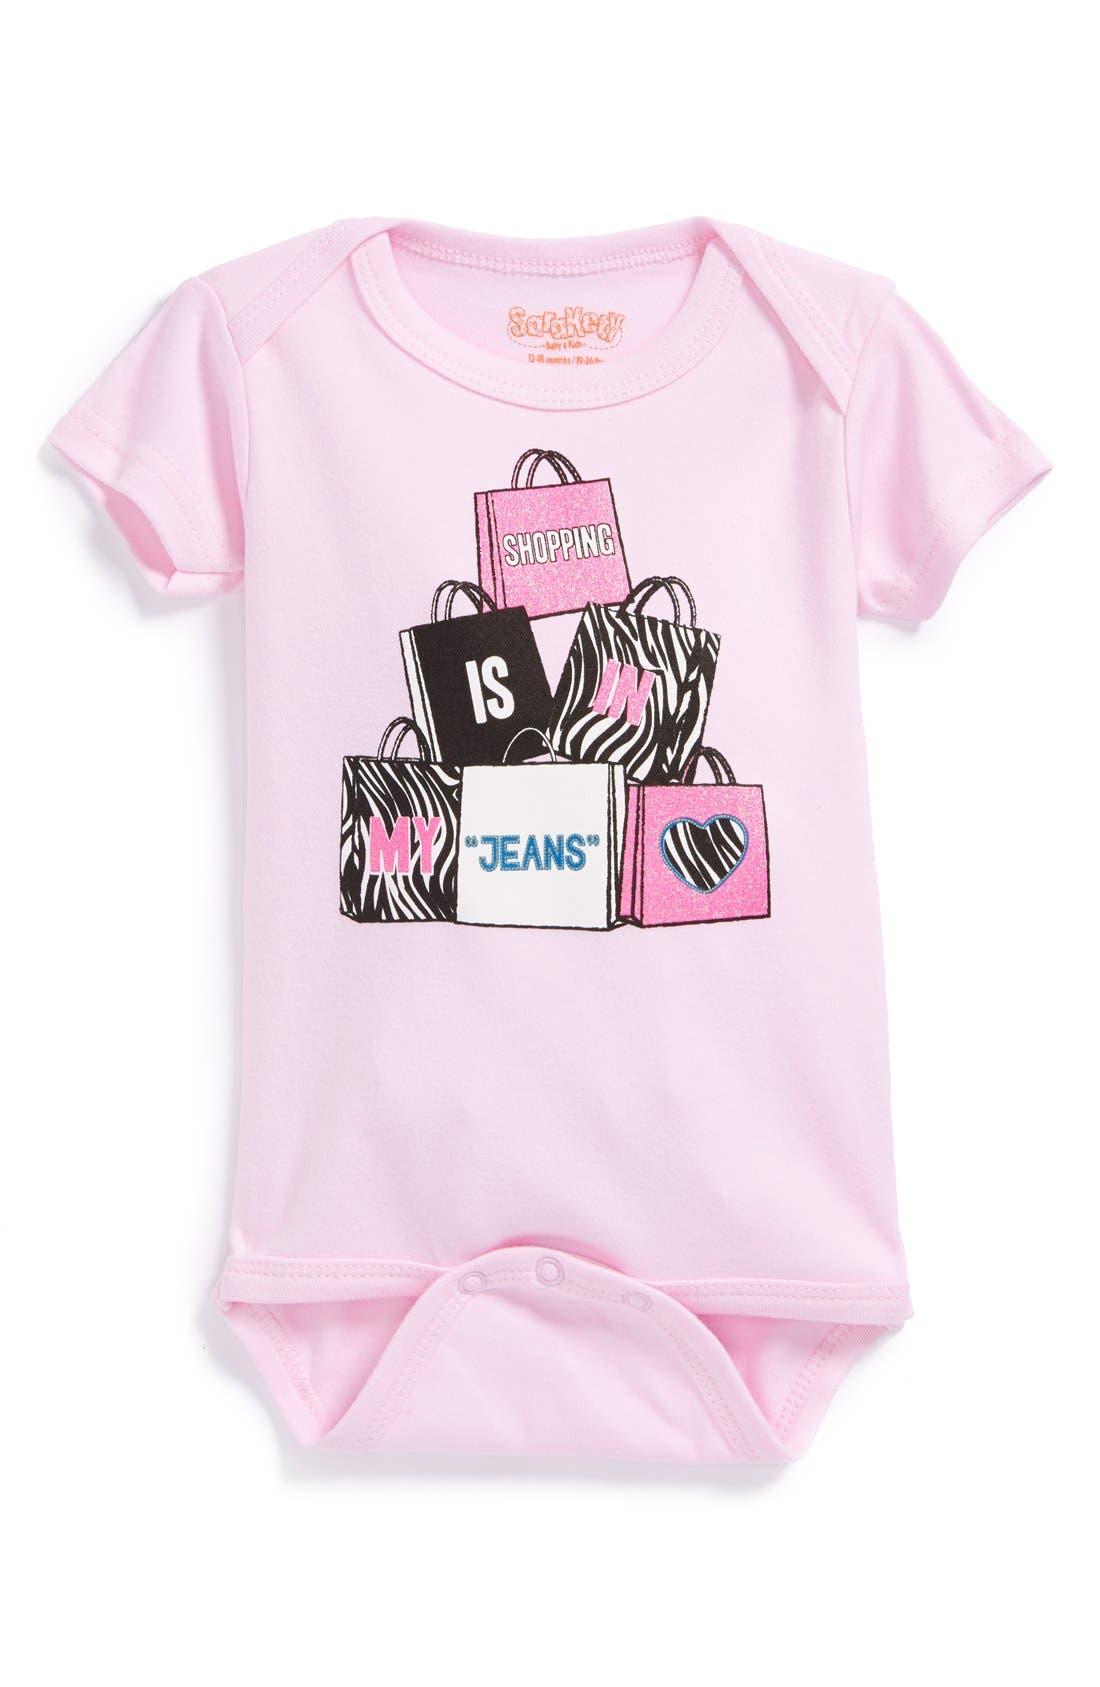 Alternate Image 1 Selected - Sara Kety Baby & Kids 'Shopping Jeans' Short Sleeve Bodysuit (Baby Girls)